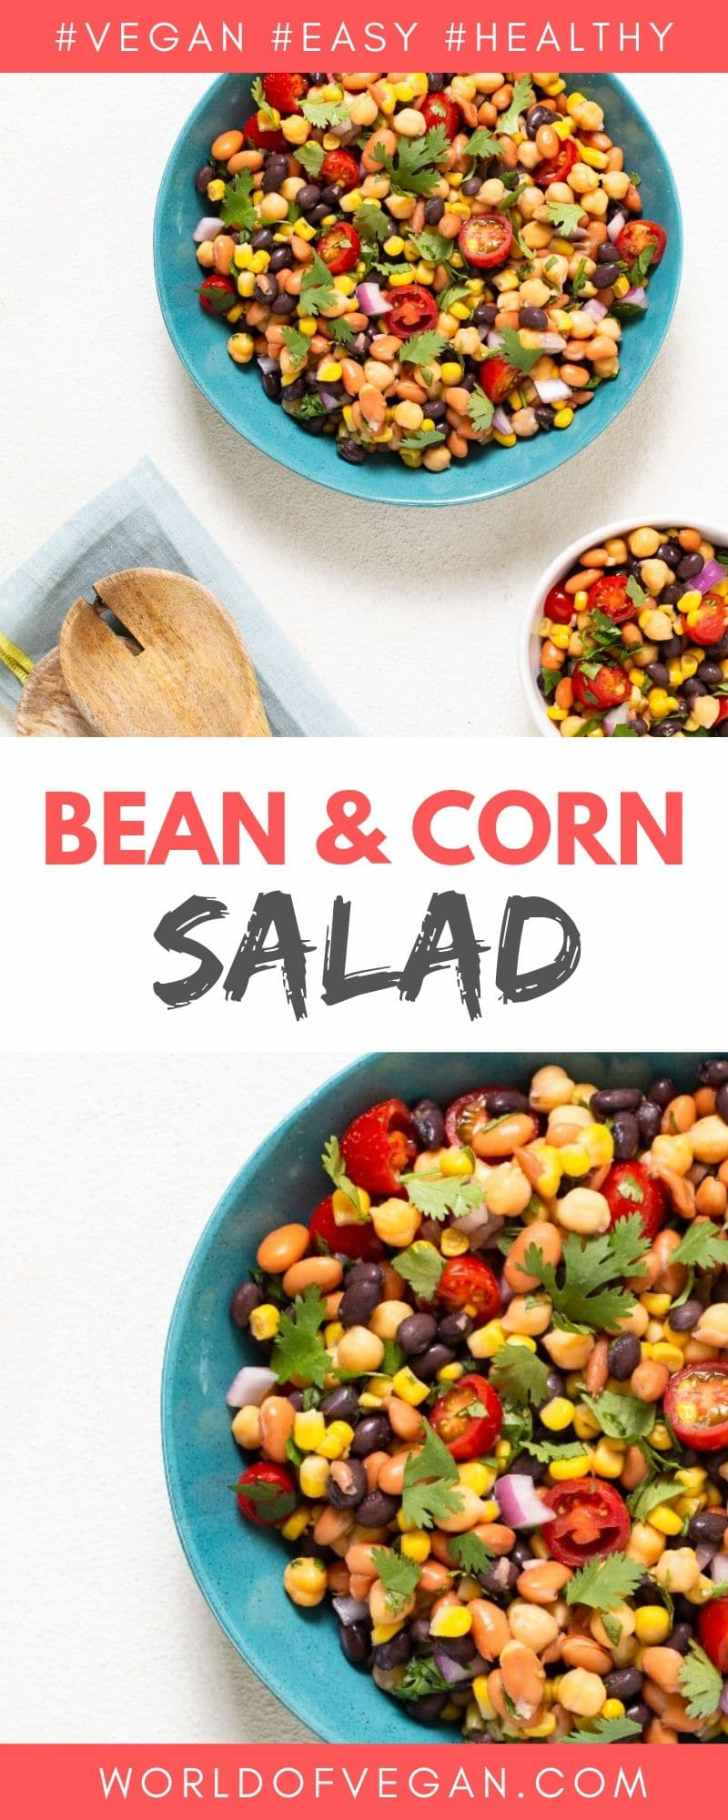 Bean & Corn Salad | WorldofVegan.com #vegan #vegetarian #recipe #healthy #mexican